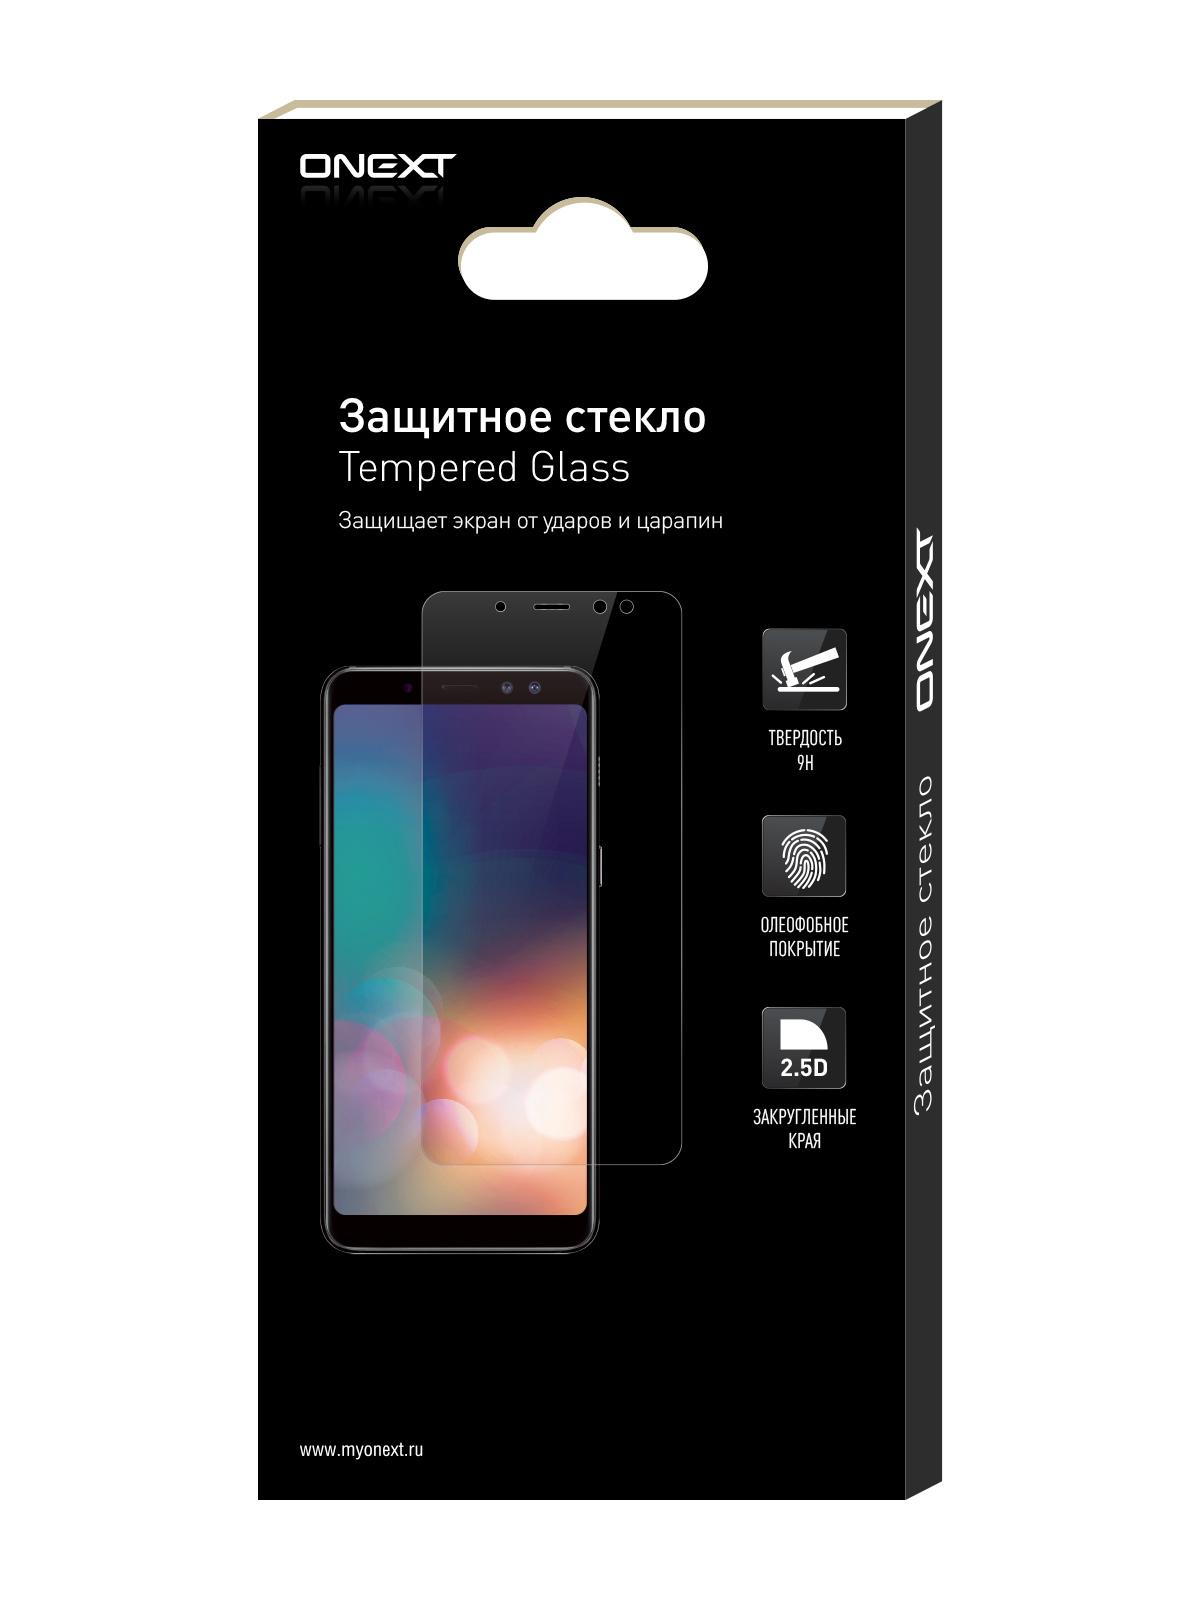 Защитное стекло ONEXT для HTC One mini 2